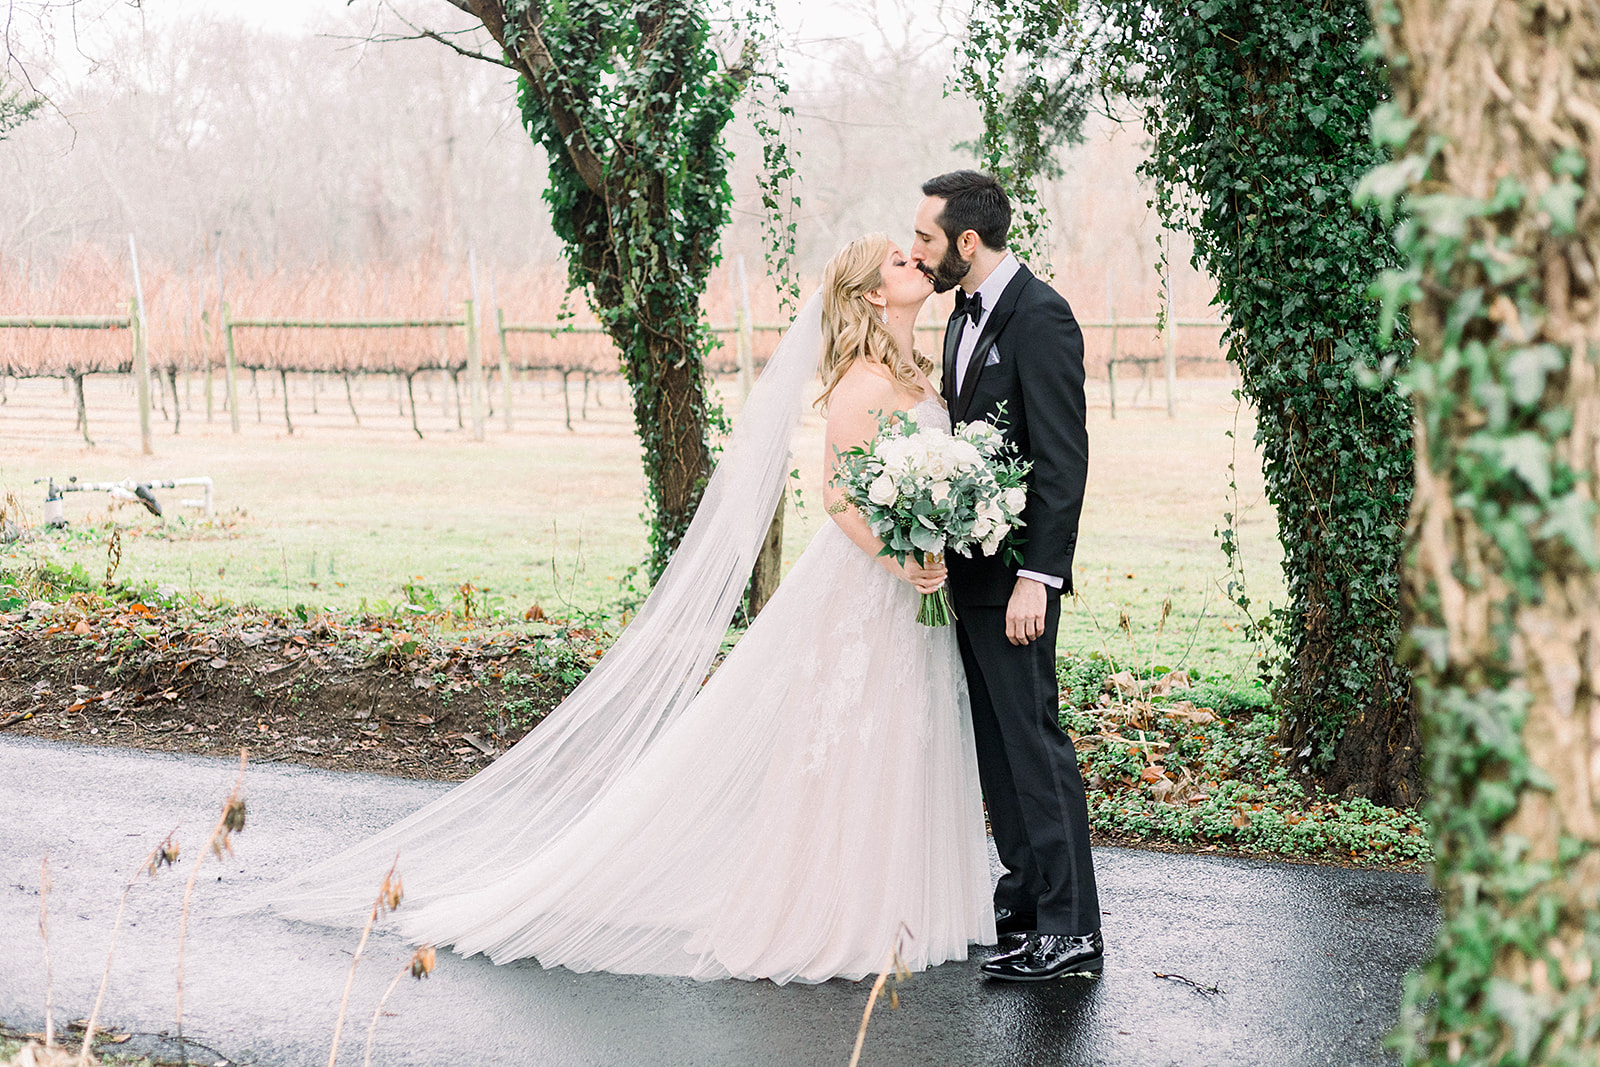 cape may nj willow creek winery wedding